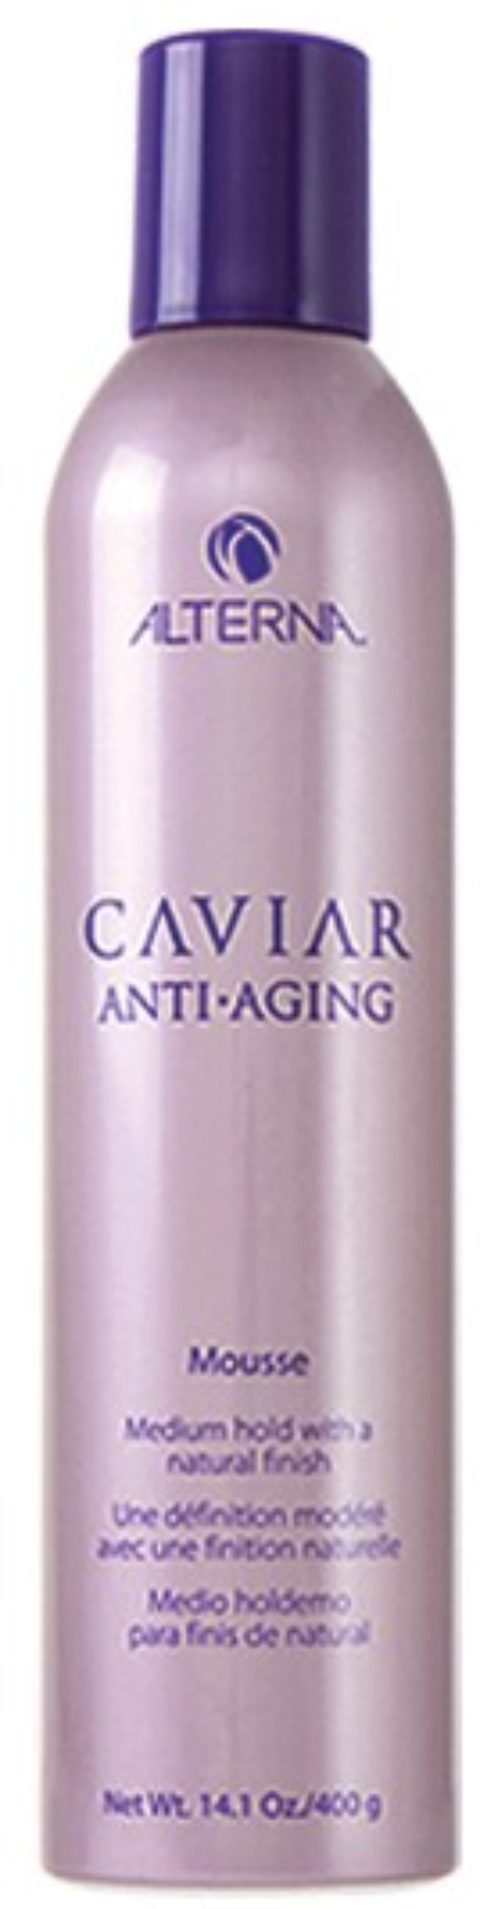 Alterna Caviar Anti aging Amplifying mousse 400gr